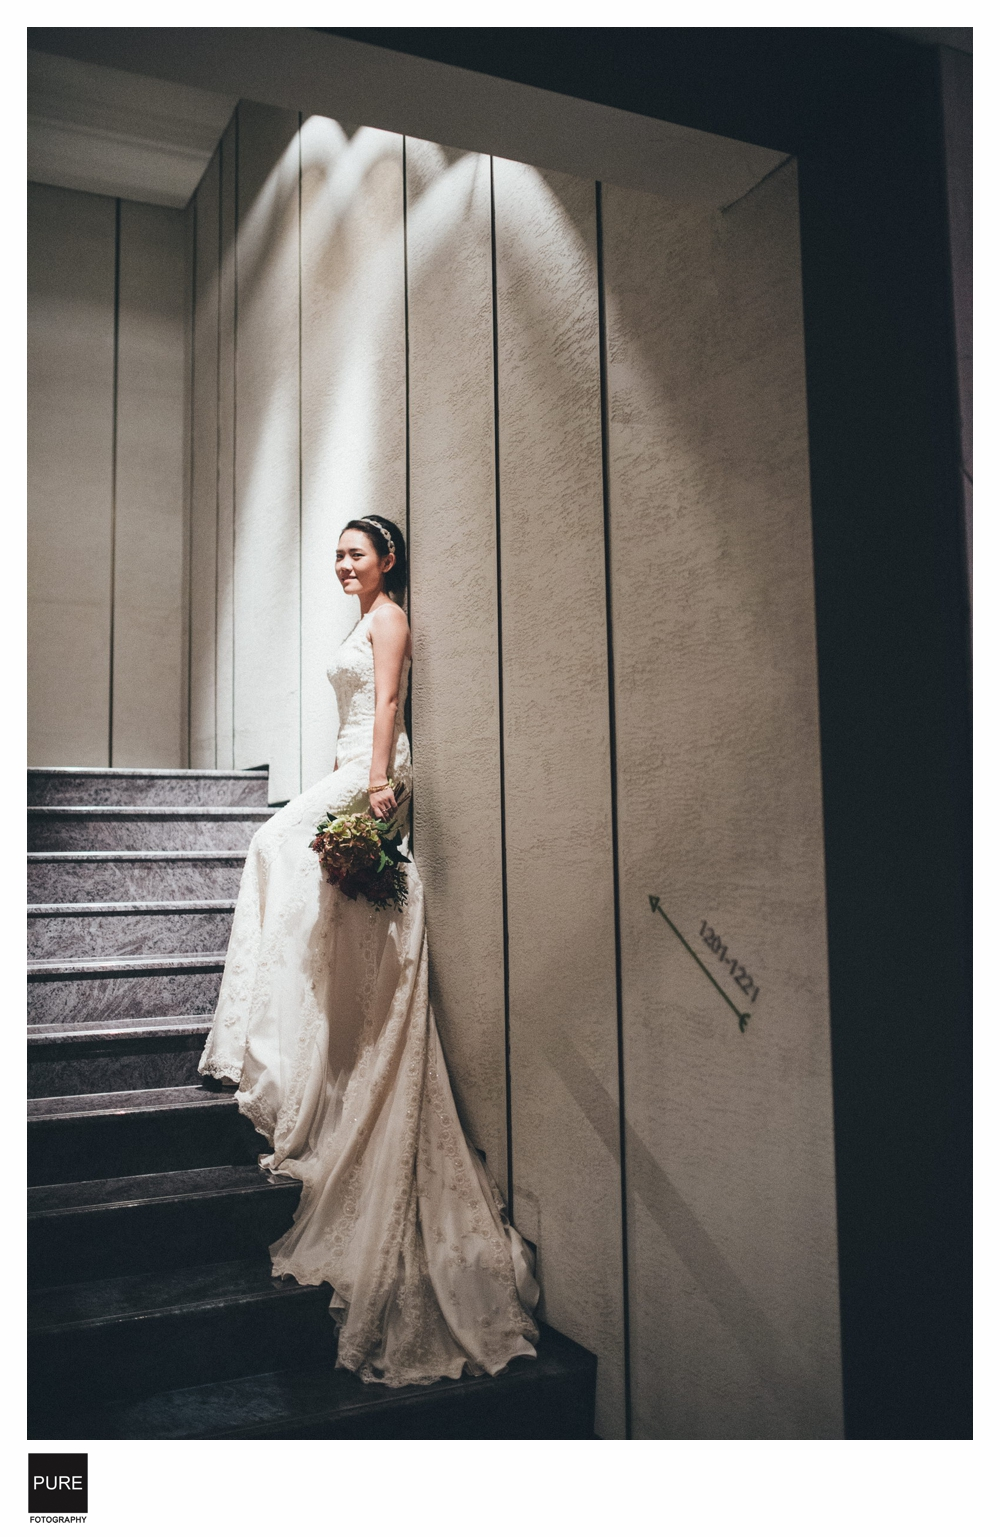 PUREFOTO_台灣婚禮平面攝影wedding_類婚紗拍攝